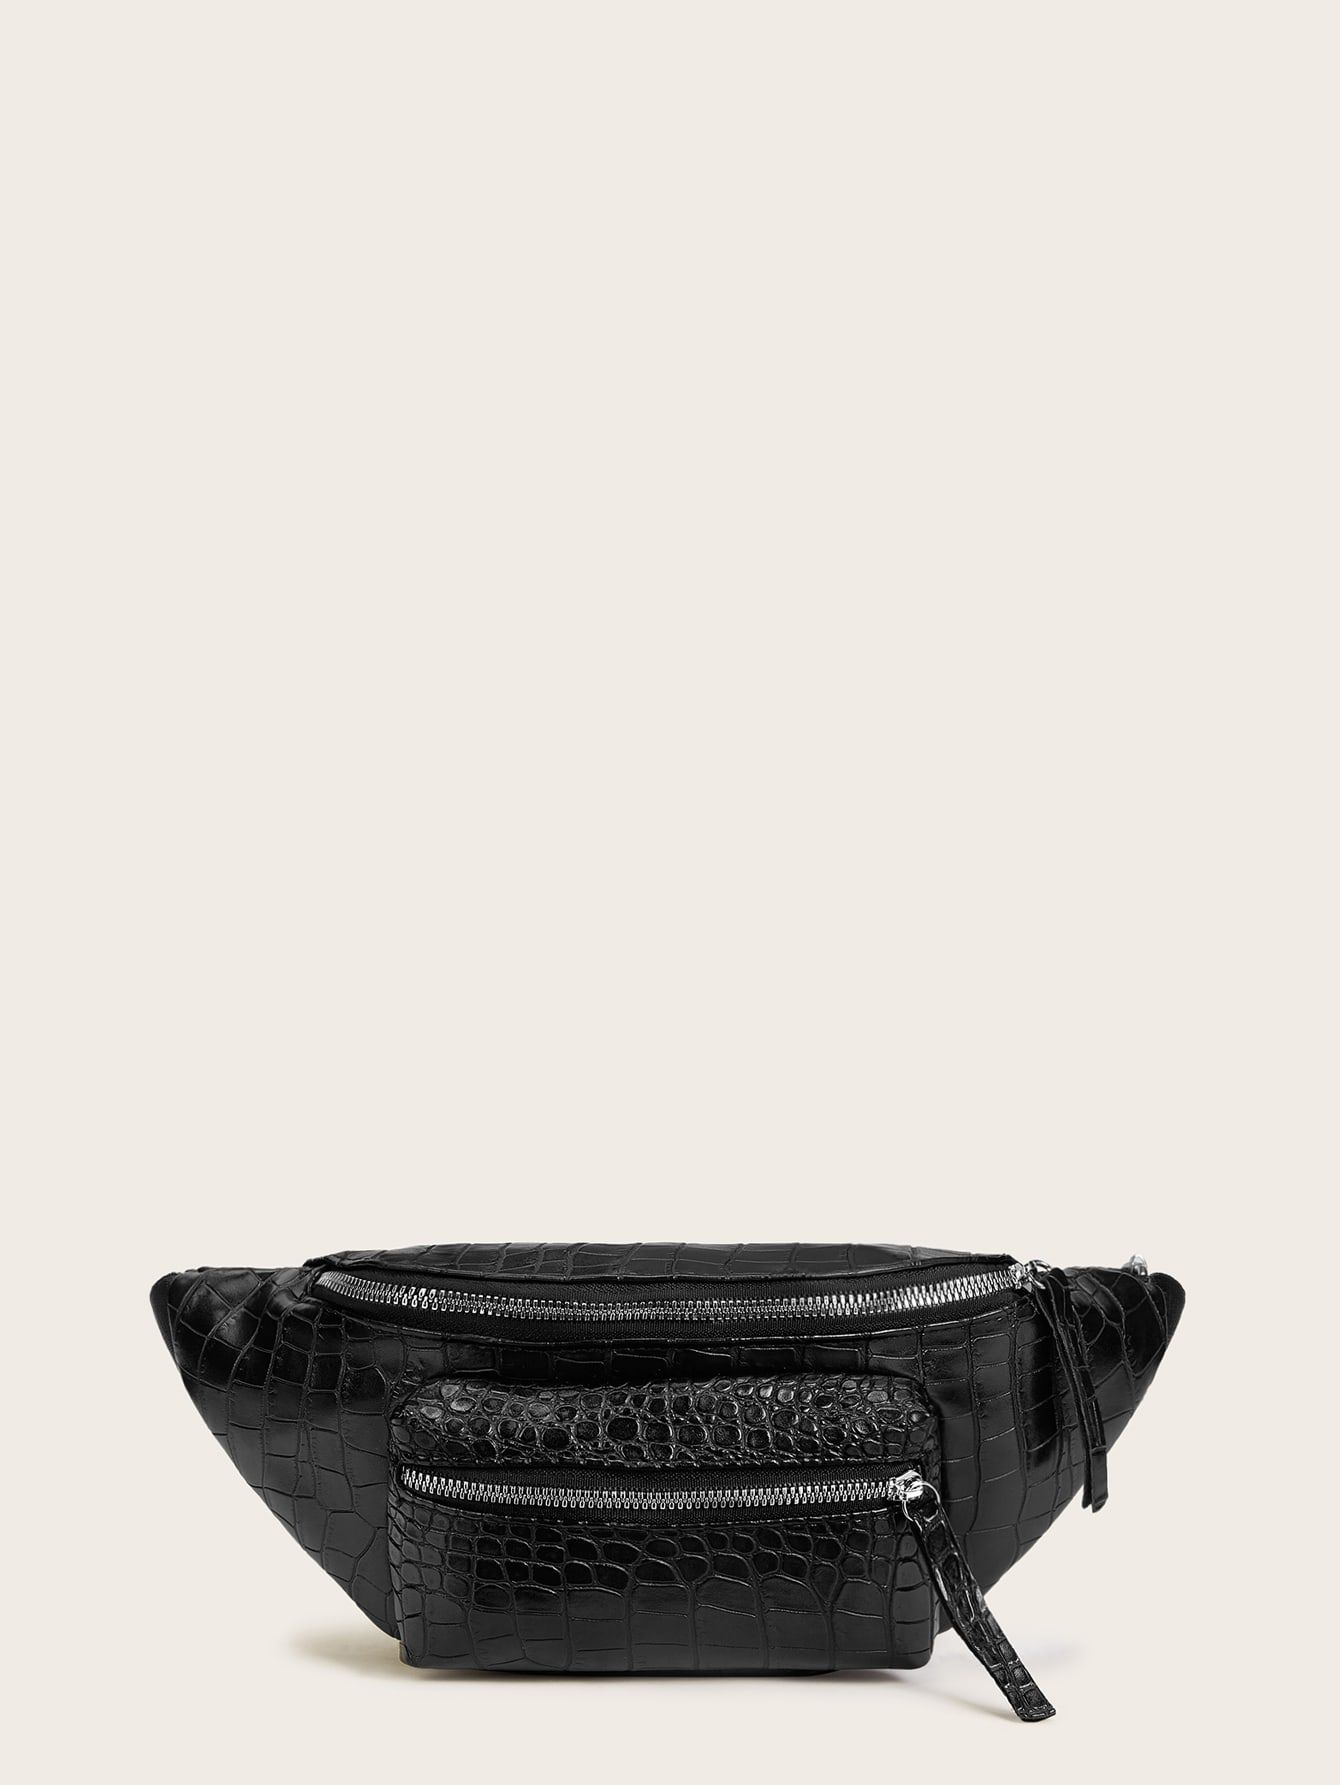 MANDARINA DUCK Mellow Leather Crossover Bag M Schultertasche Umhängetasche Nero